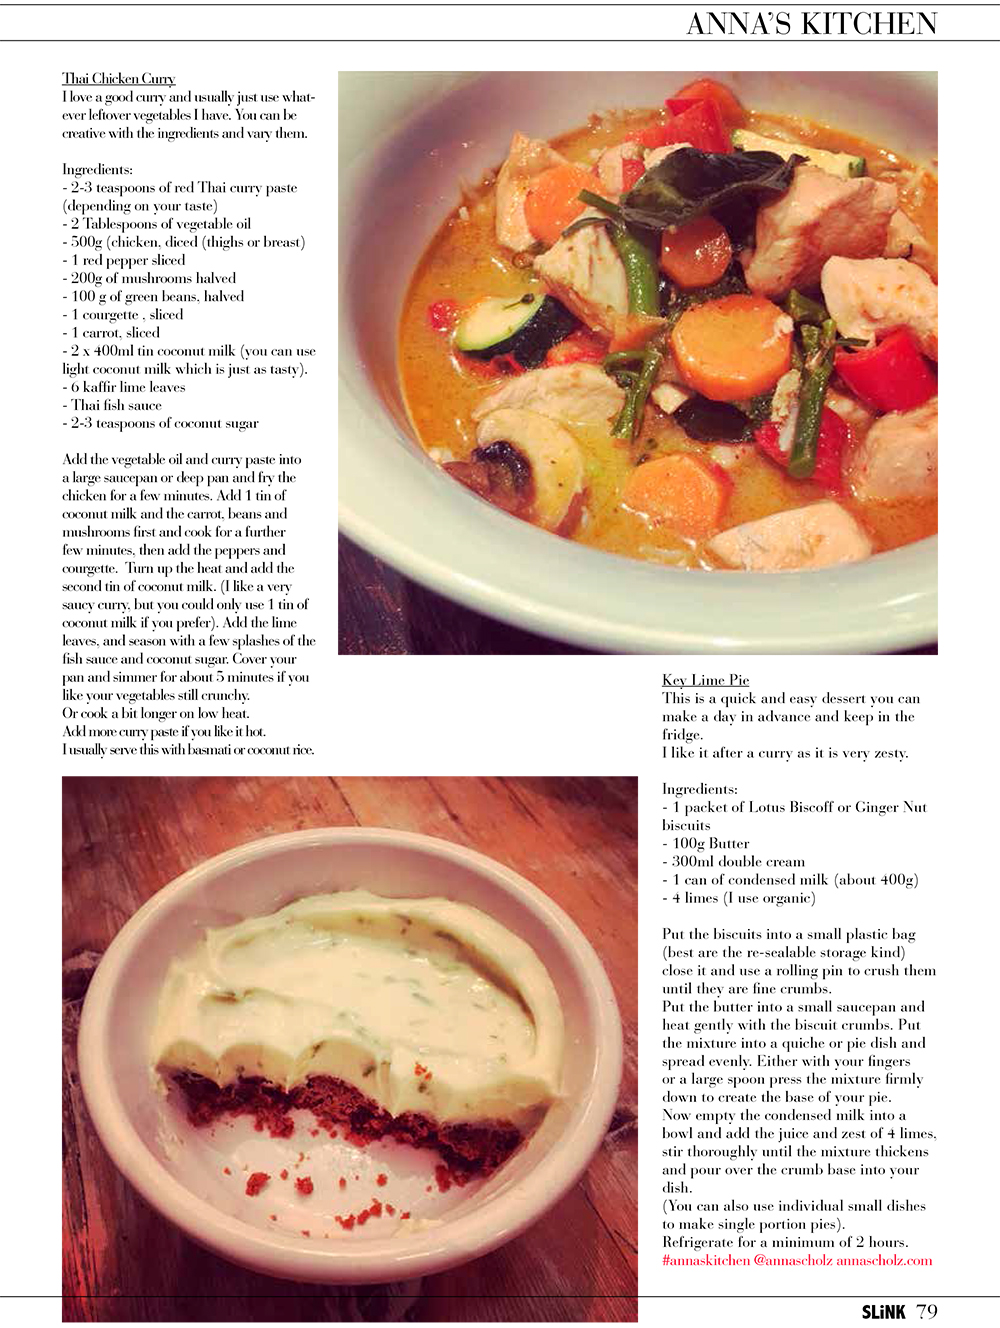 Anna Scholz Anna's Kitchen Recipes for Slink Magazine